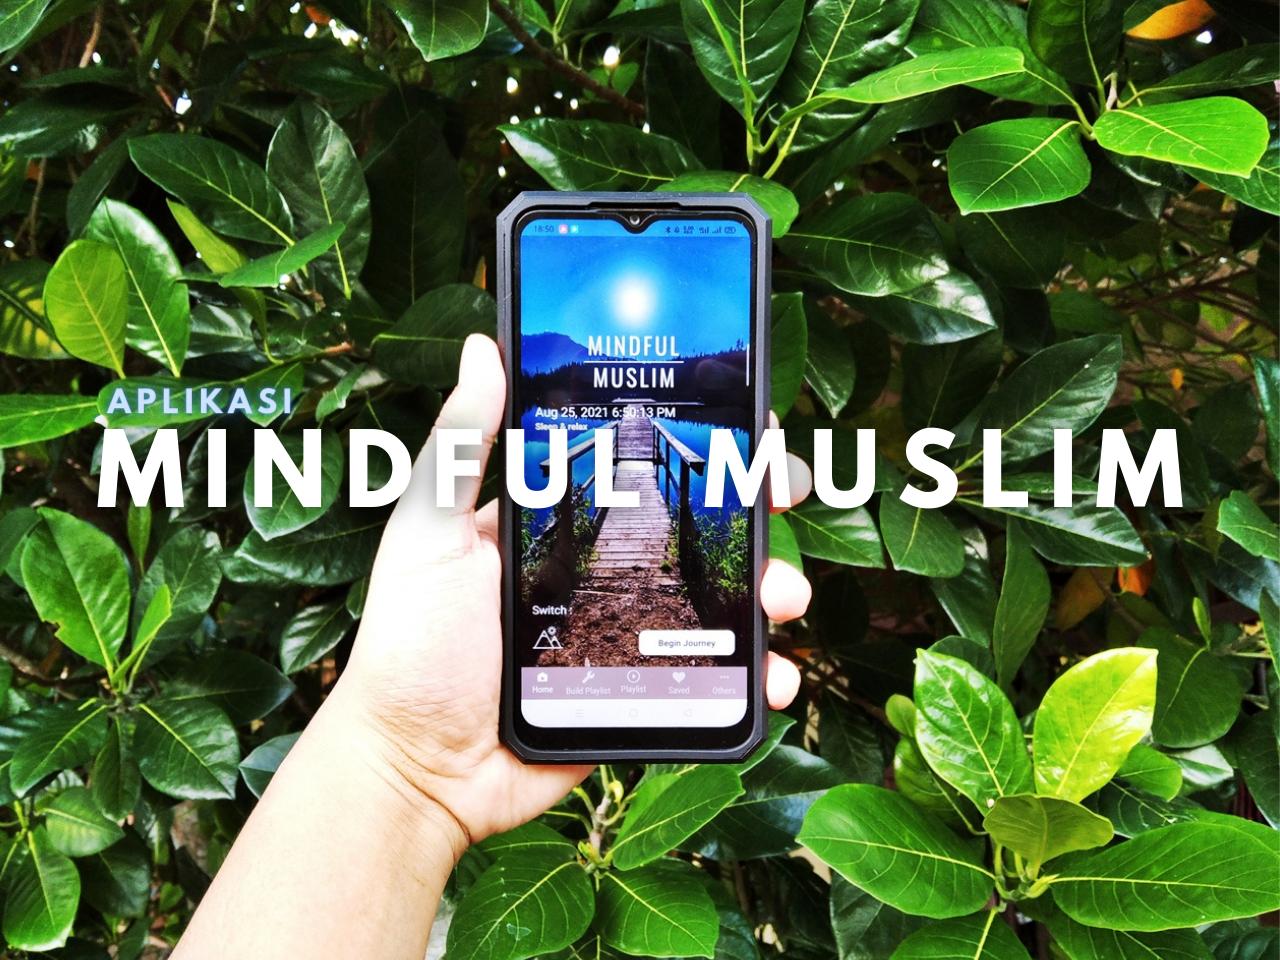 Aplikasi Mindful Muslim